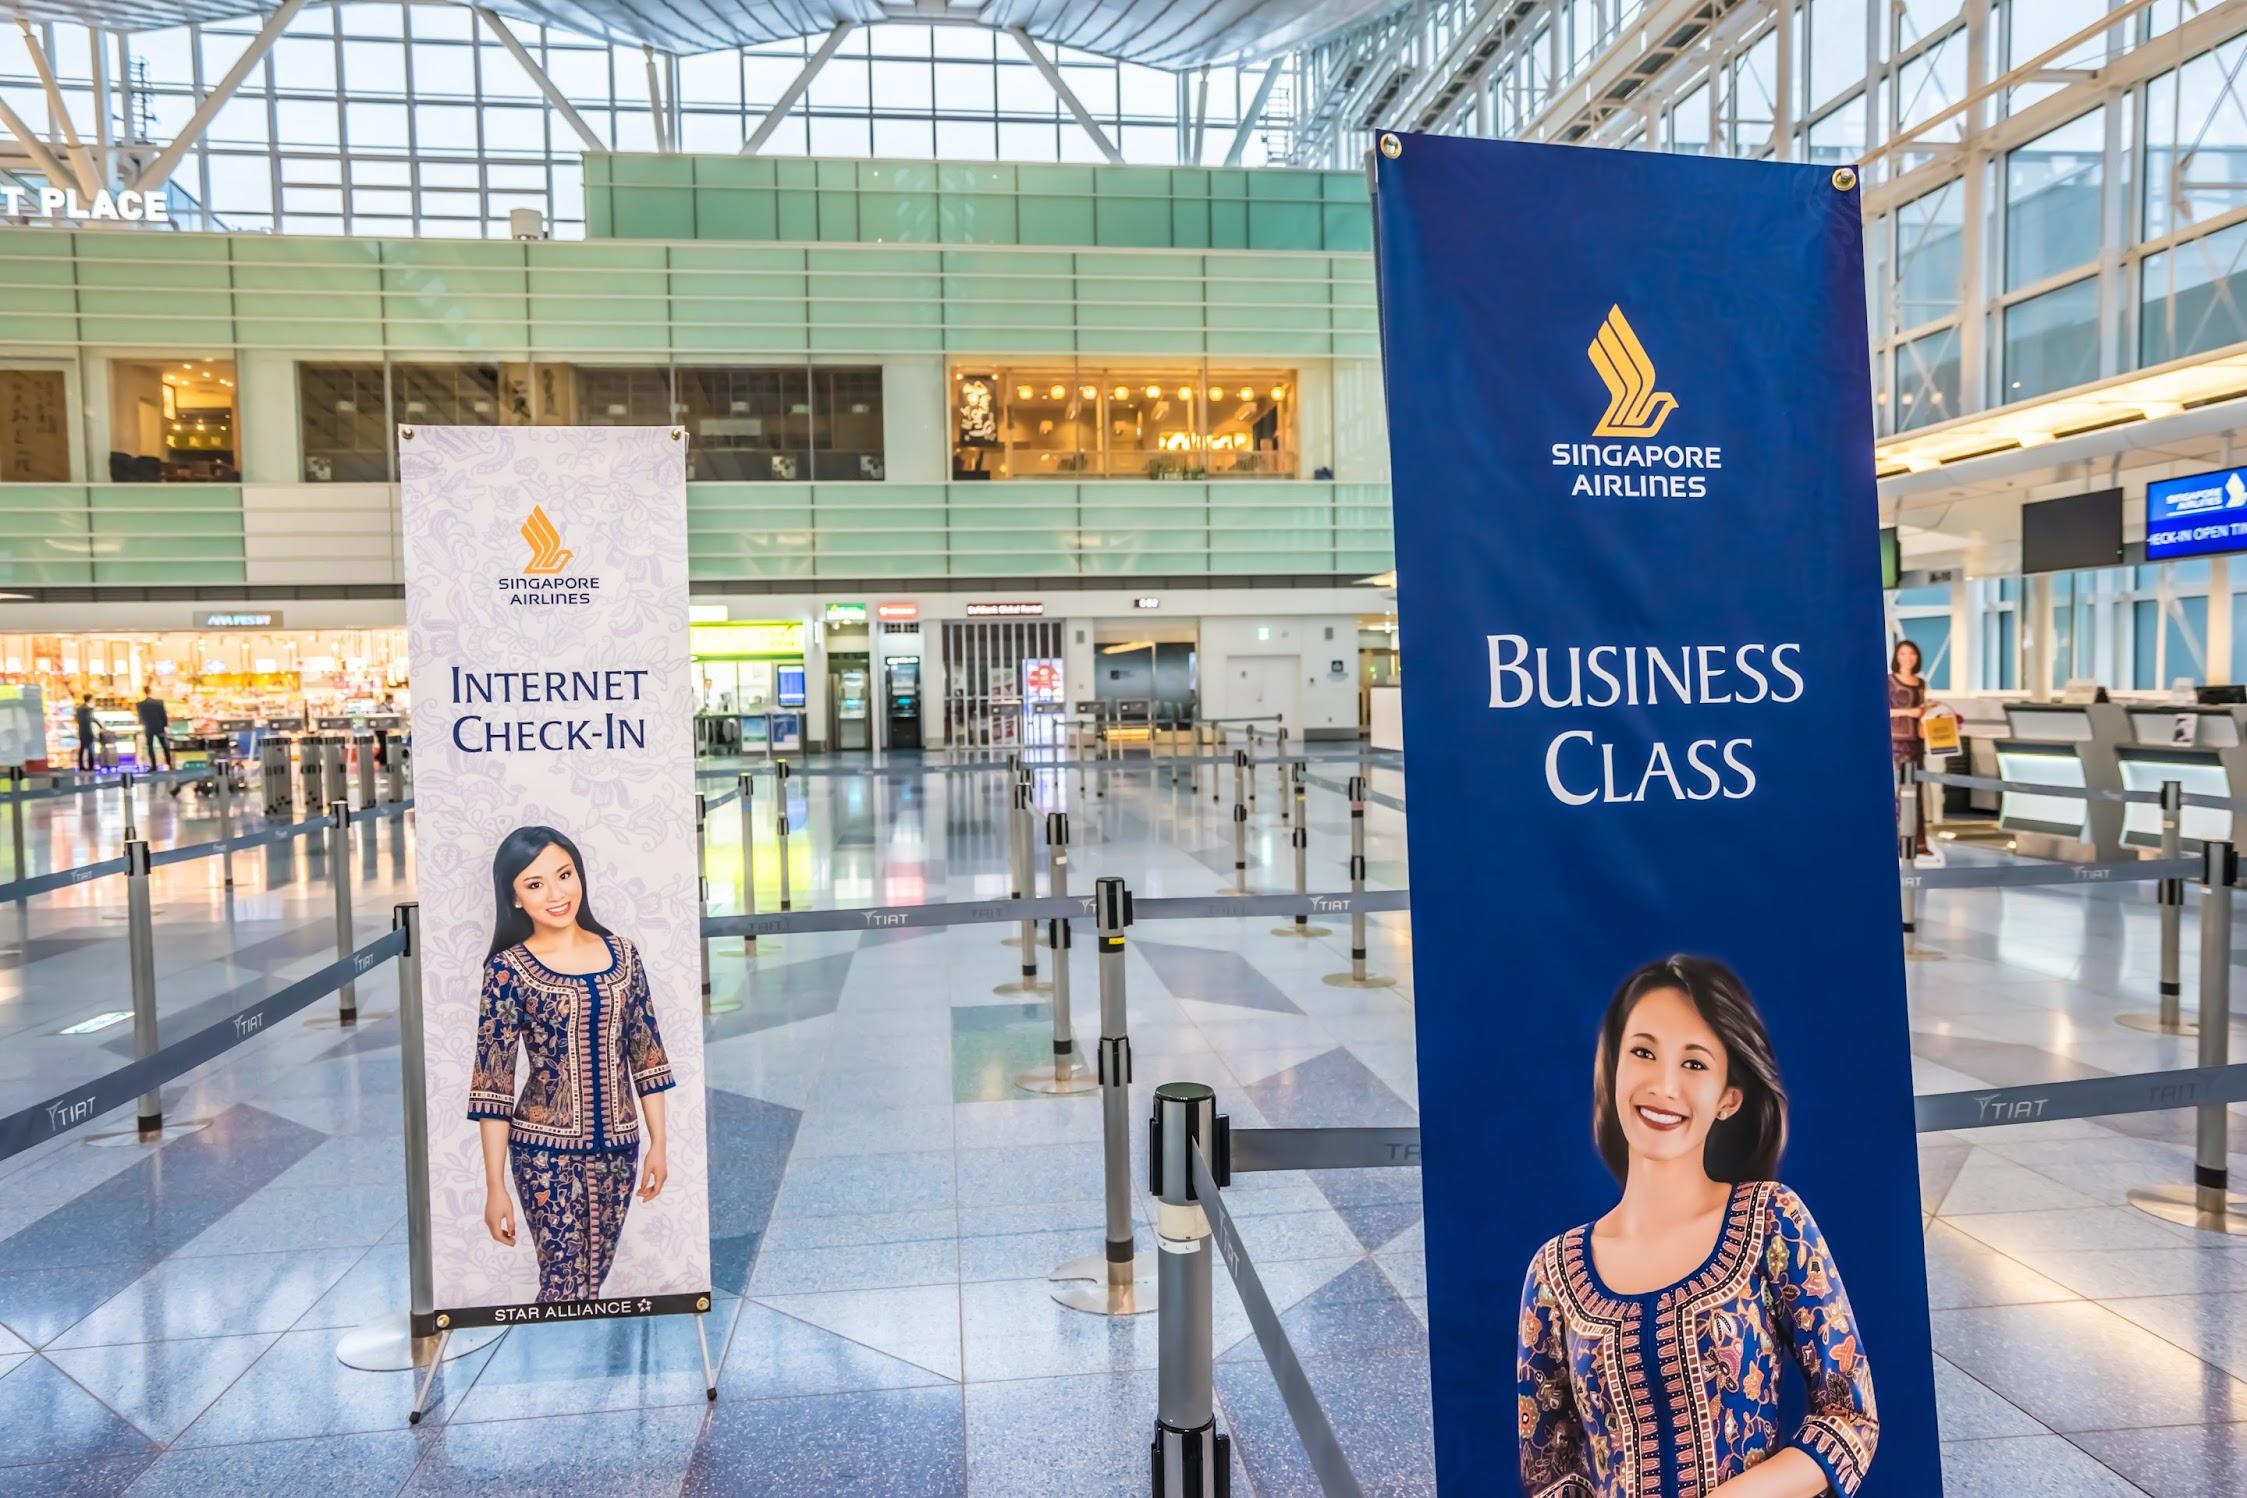 Haneda Airport Singapore Airlines